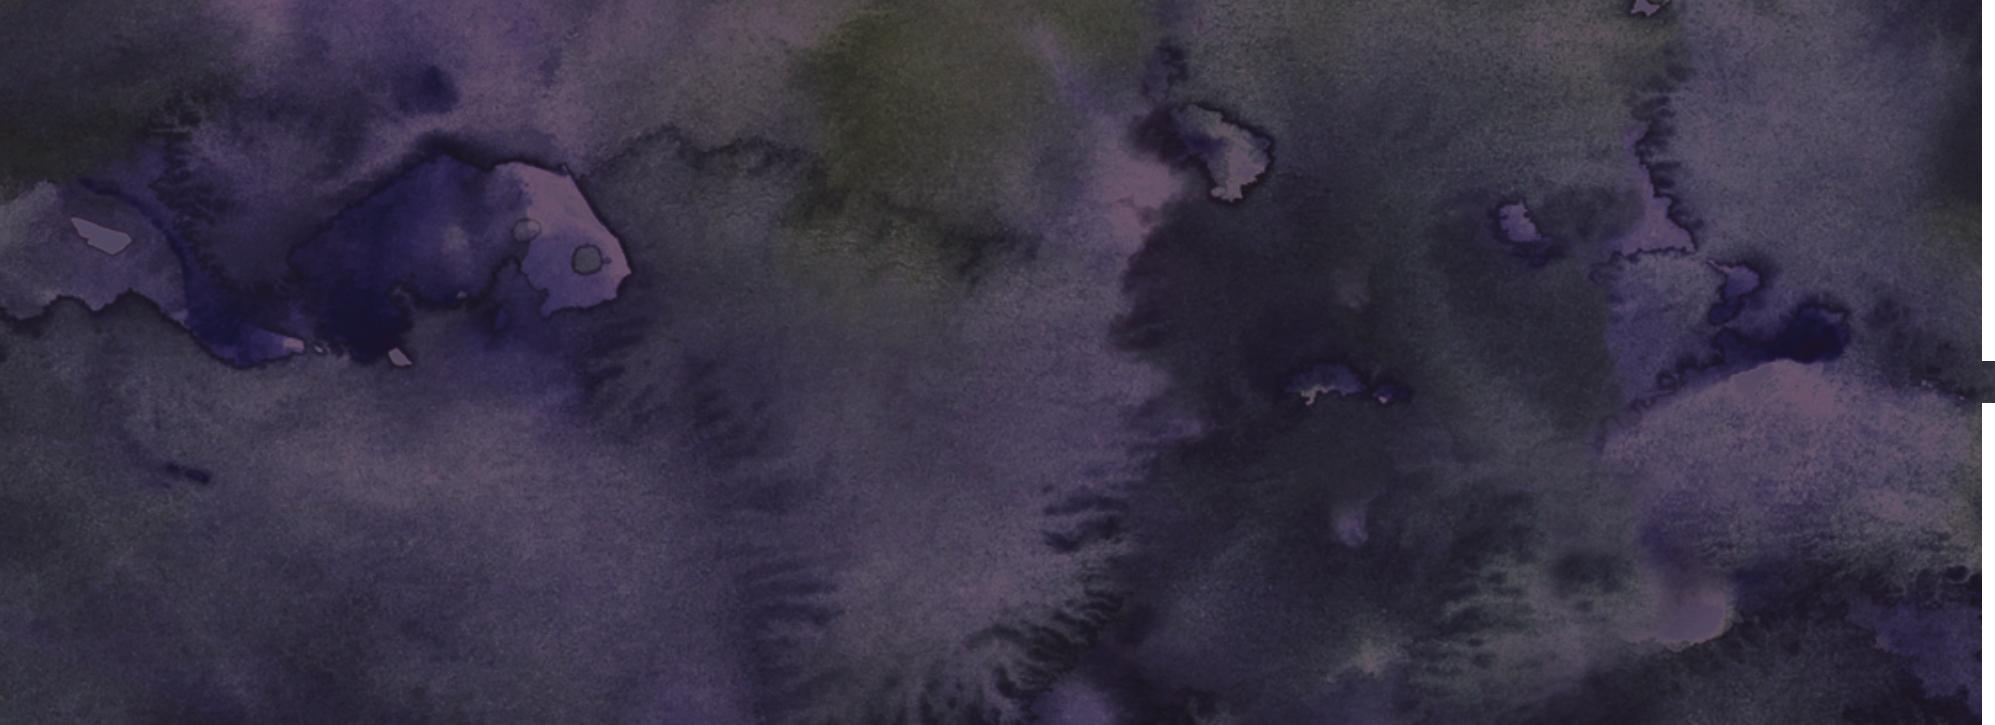 jadore_detroit_secondary_logo_07